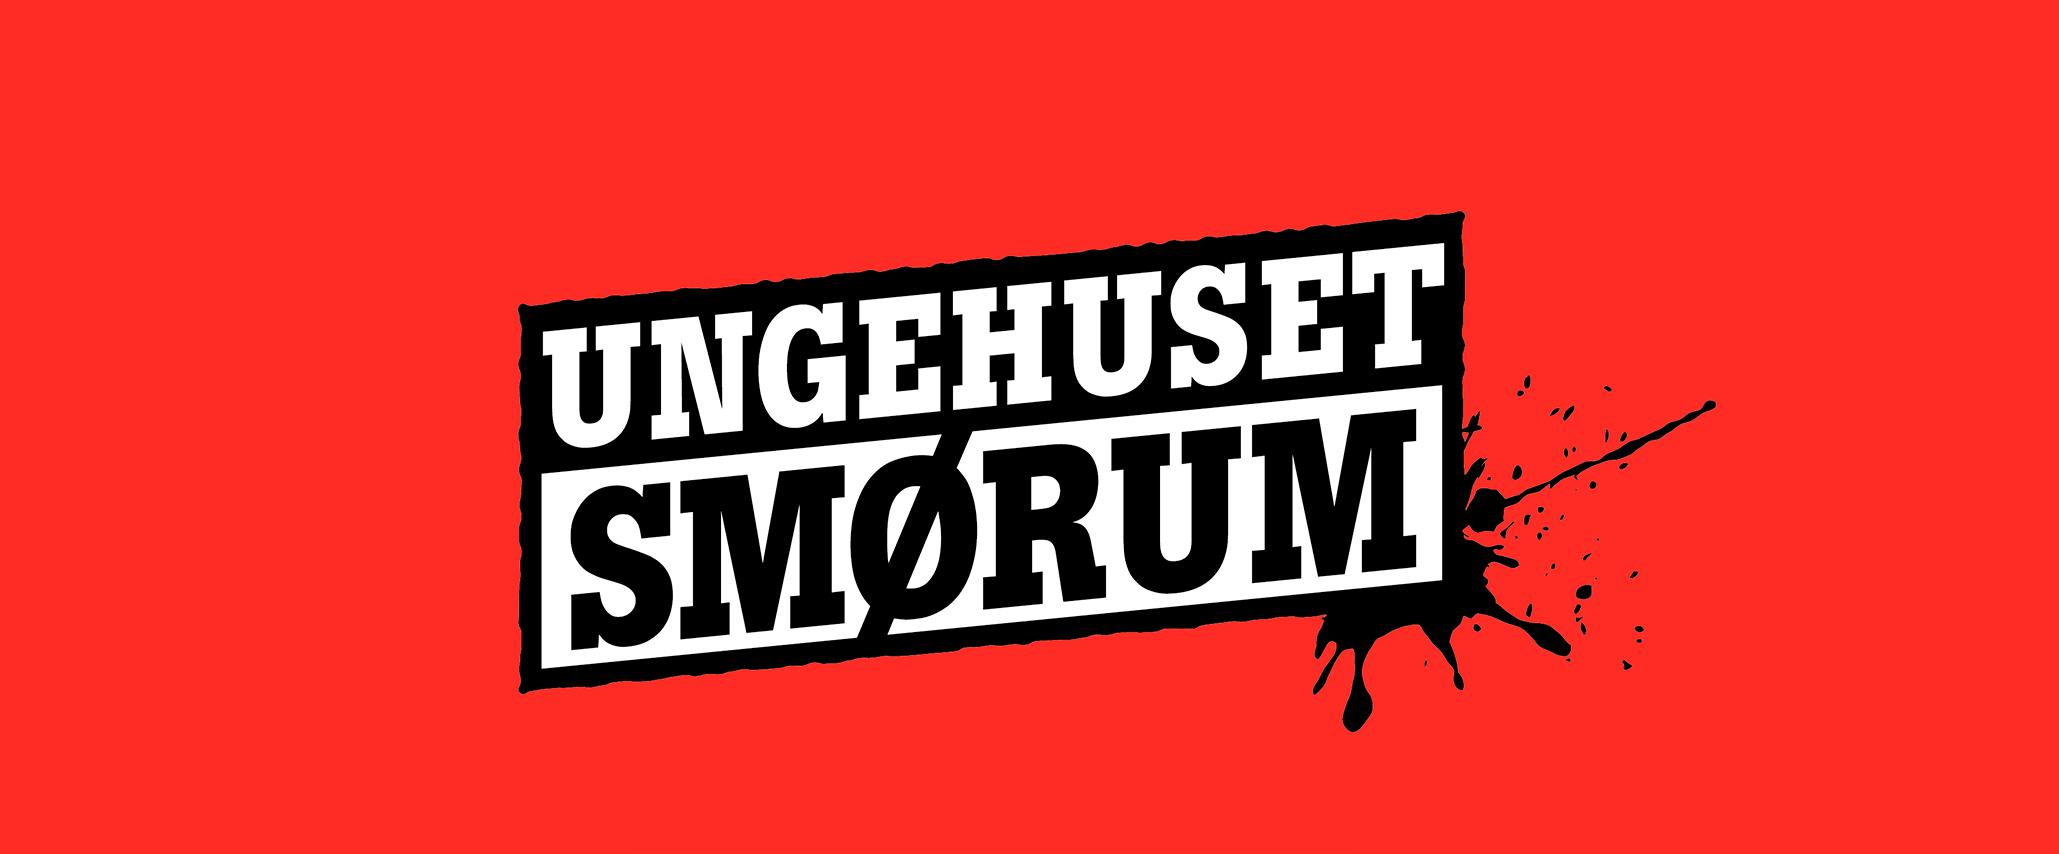 Ungehuset Smørum Logodesign - Design: Tegnestuen Undertryk